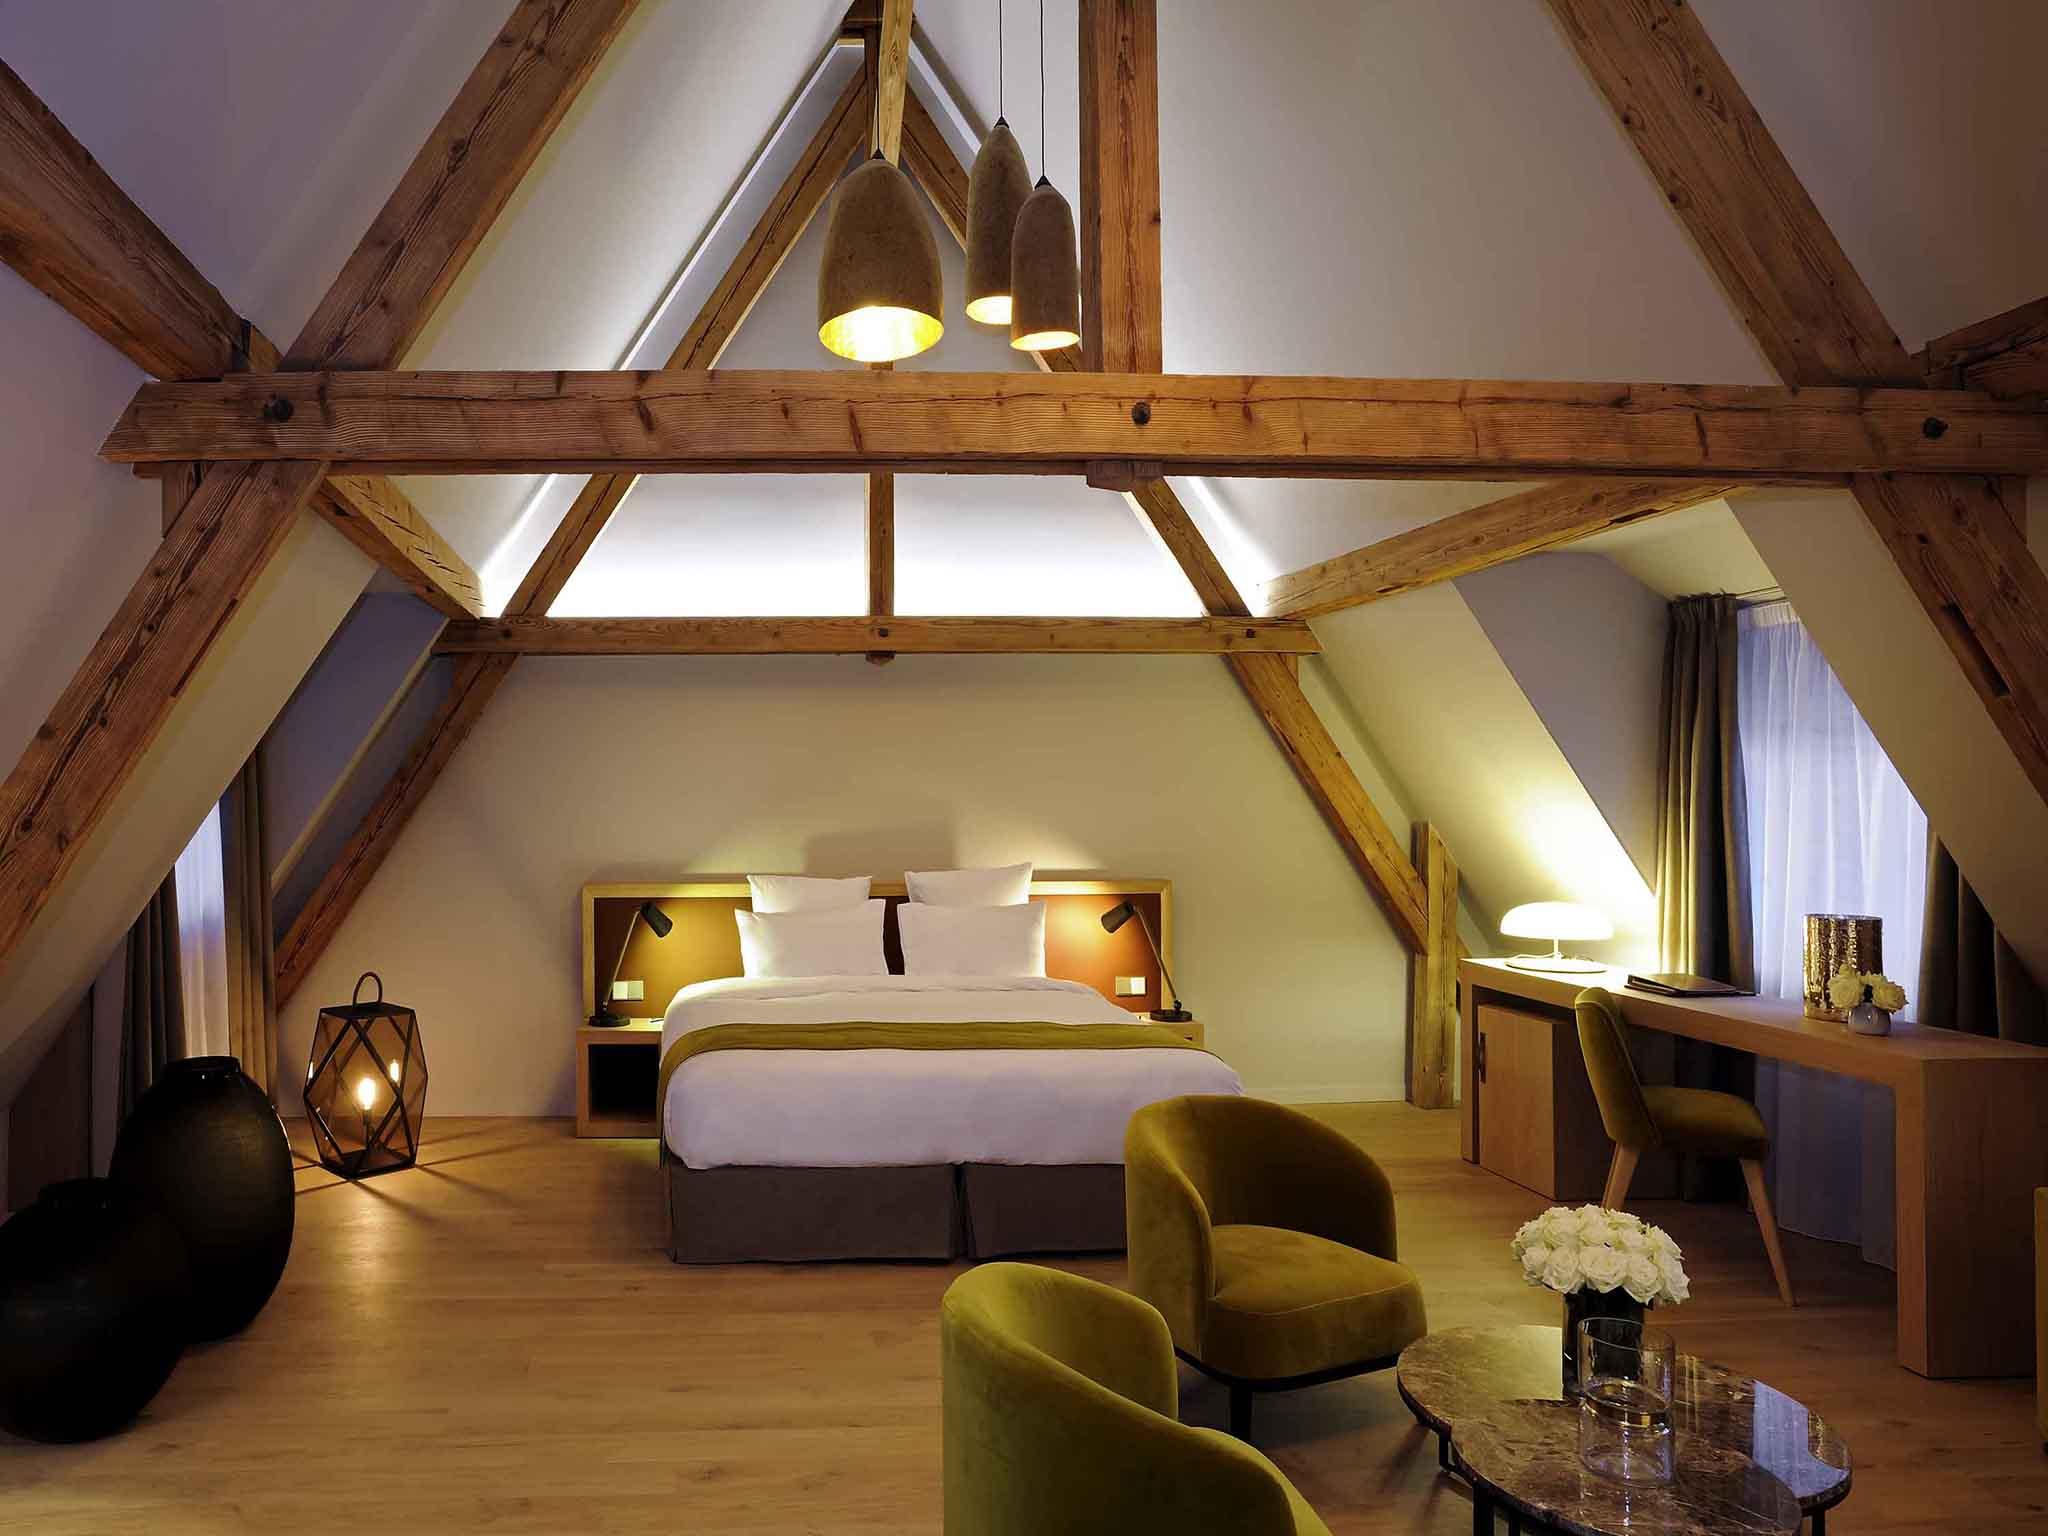 فندق - 5 Terres Hôtel & Spa Barr - MGallery by Sofitel